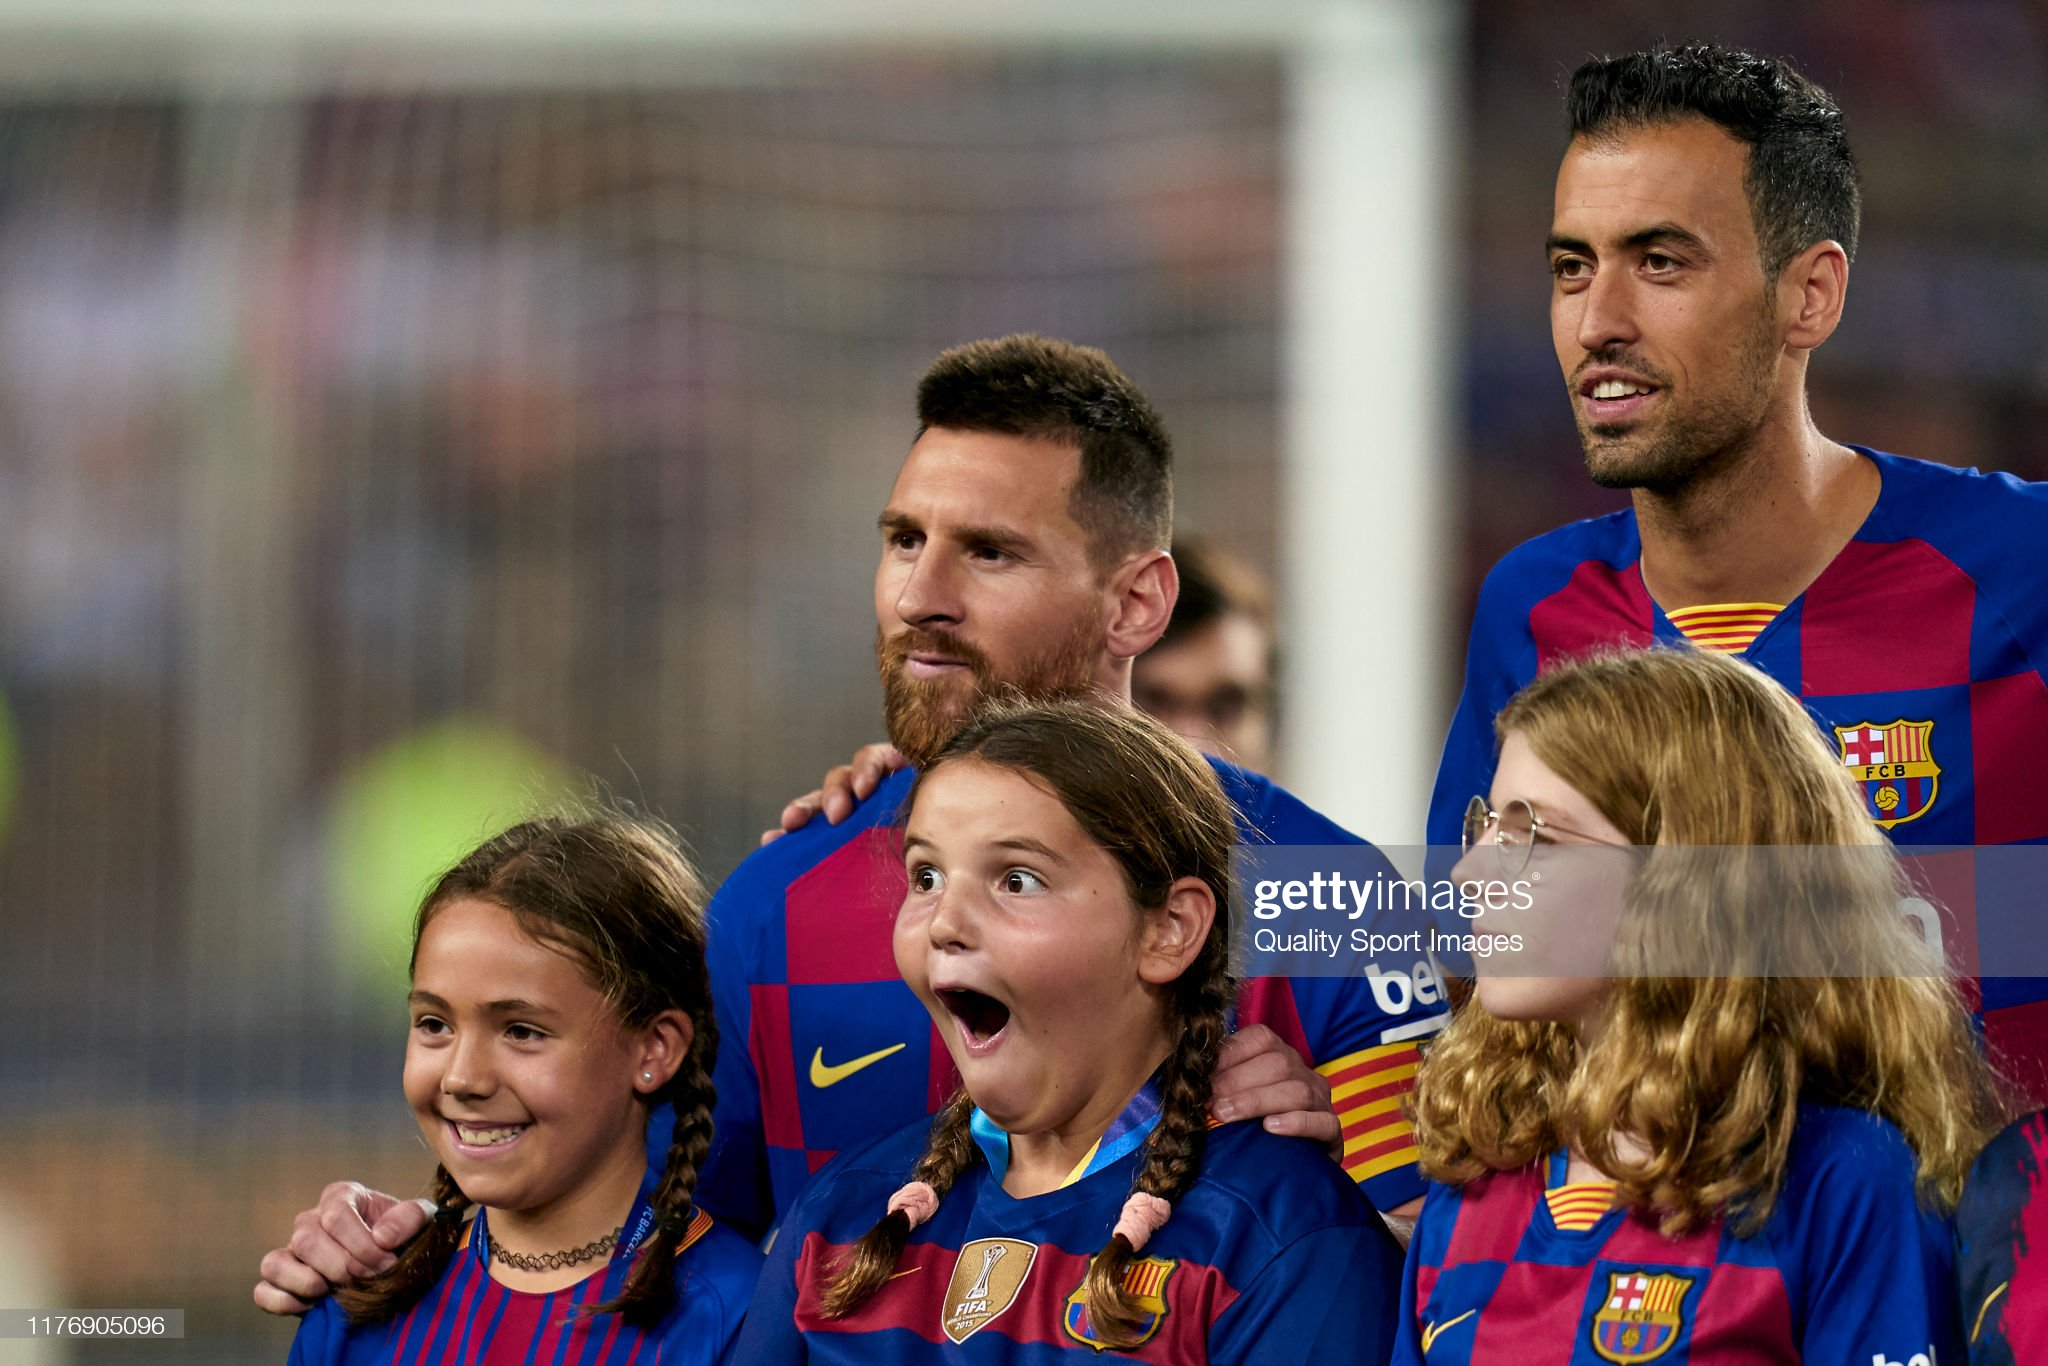 صور مباراة : برشلونة - فياريال 2-1 ( 24-09-2019 )  Girl-reacts-when-lionel-messi-of-fc-barcelona-poses-for-a-photo-prior-picture-id1176905096?s=2048x2048